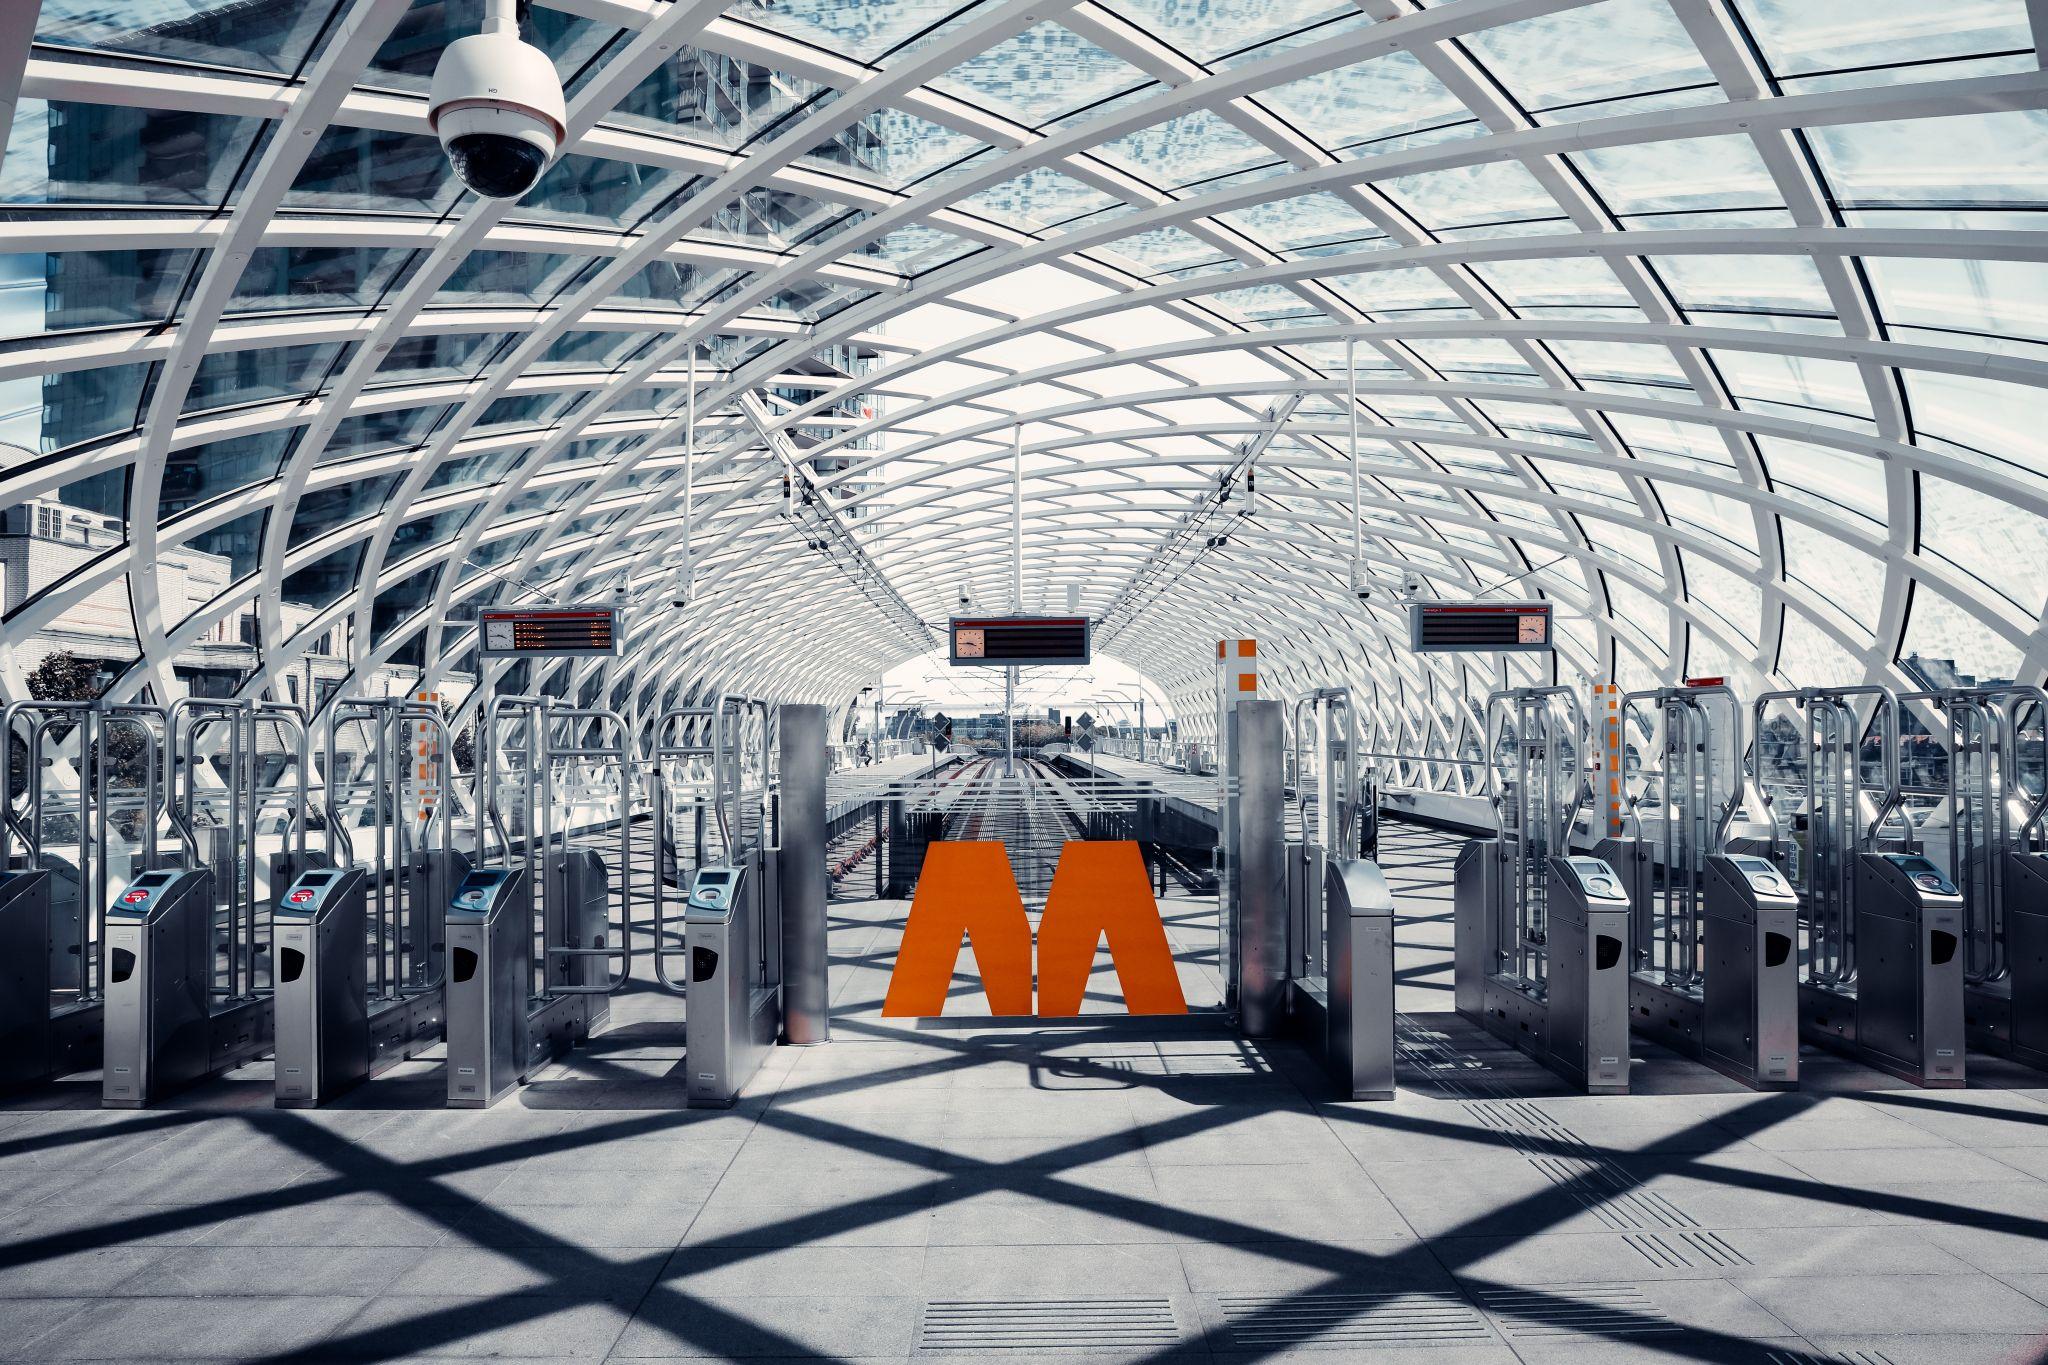 Den Haag CS Tram Station, Netherlands